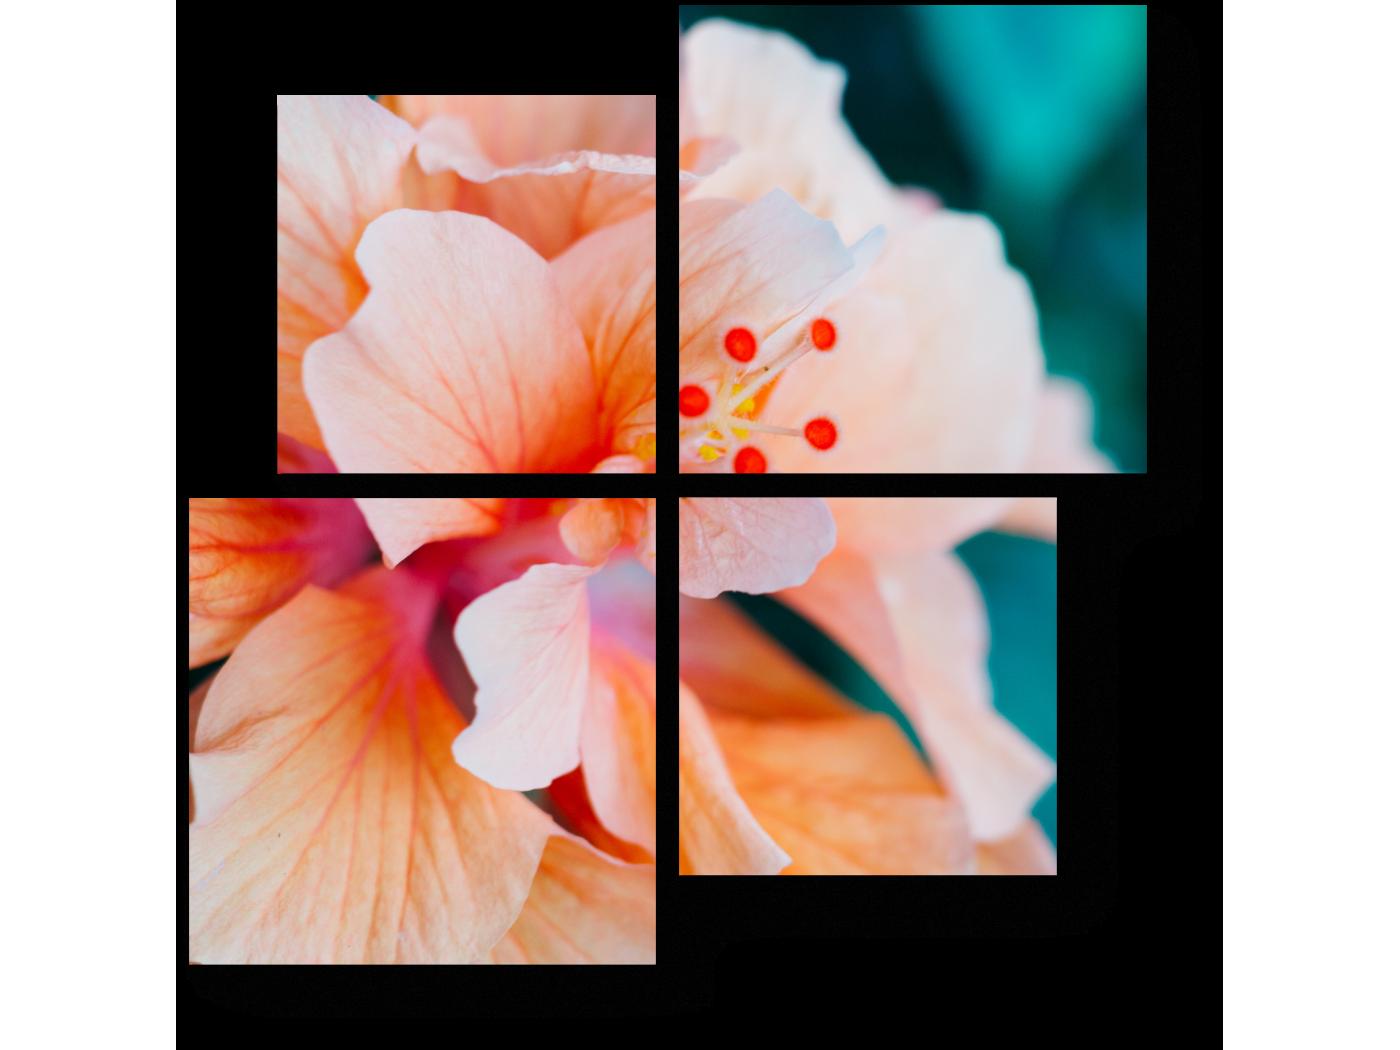 Модульная картина Макро цветок (50x50) фото